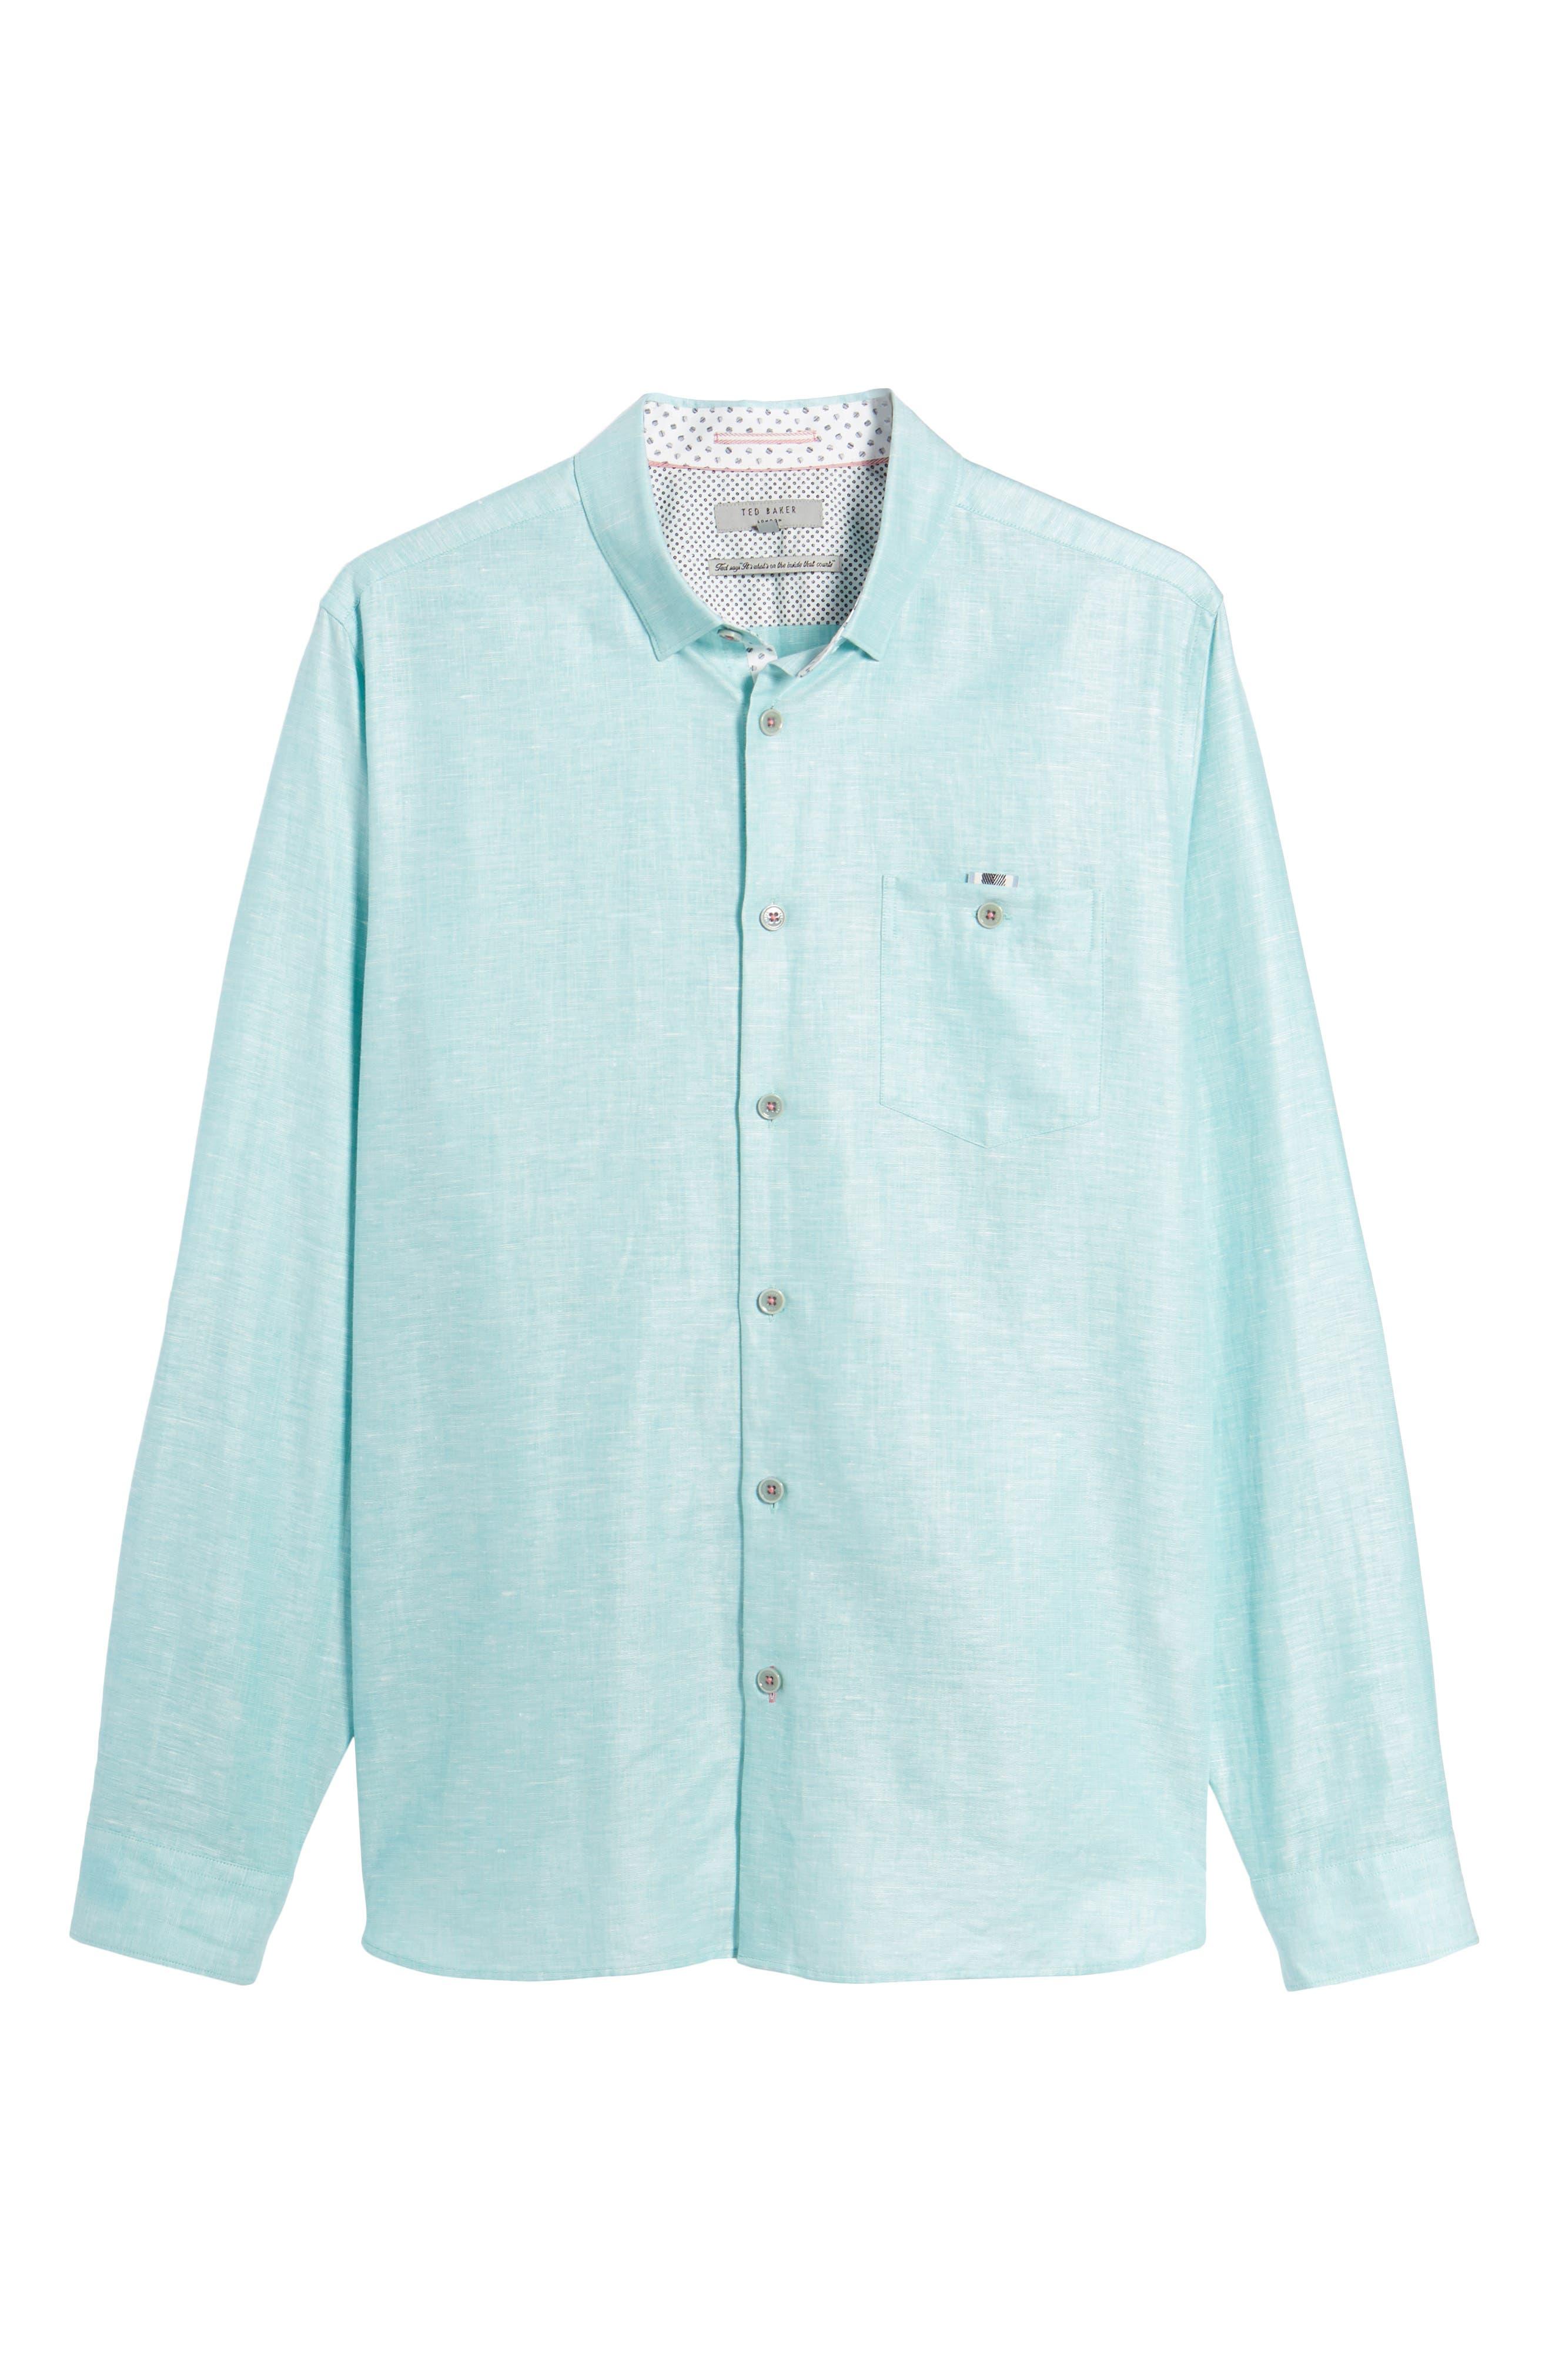 Linlins Herringbone Cotton & Linen Sport Shirt,                             Alternate thumbnail 26, color,